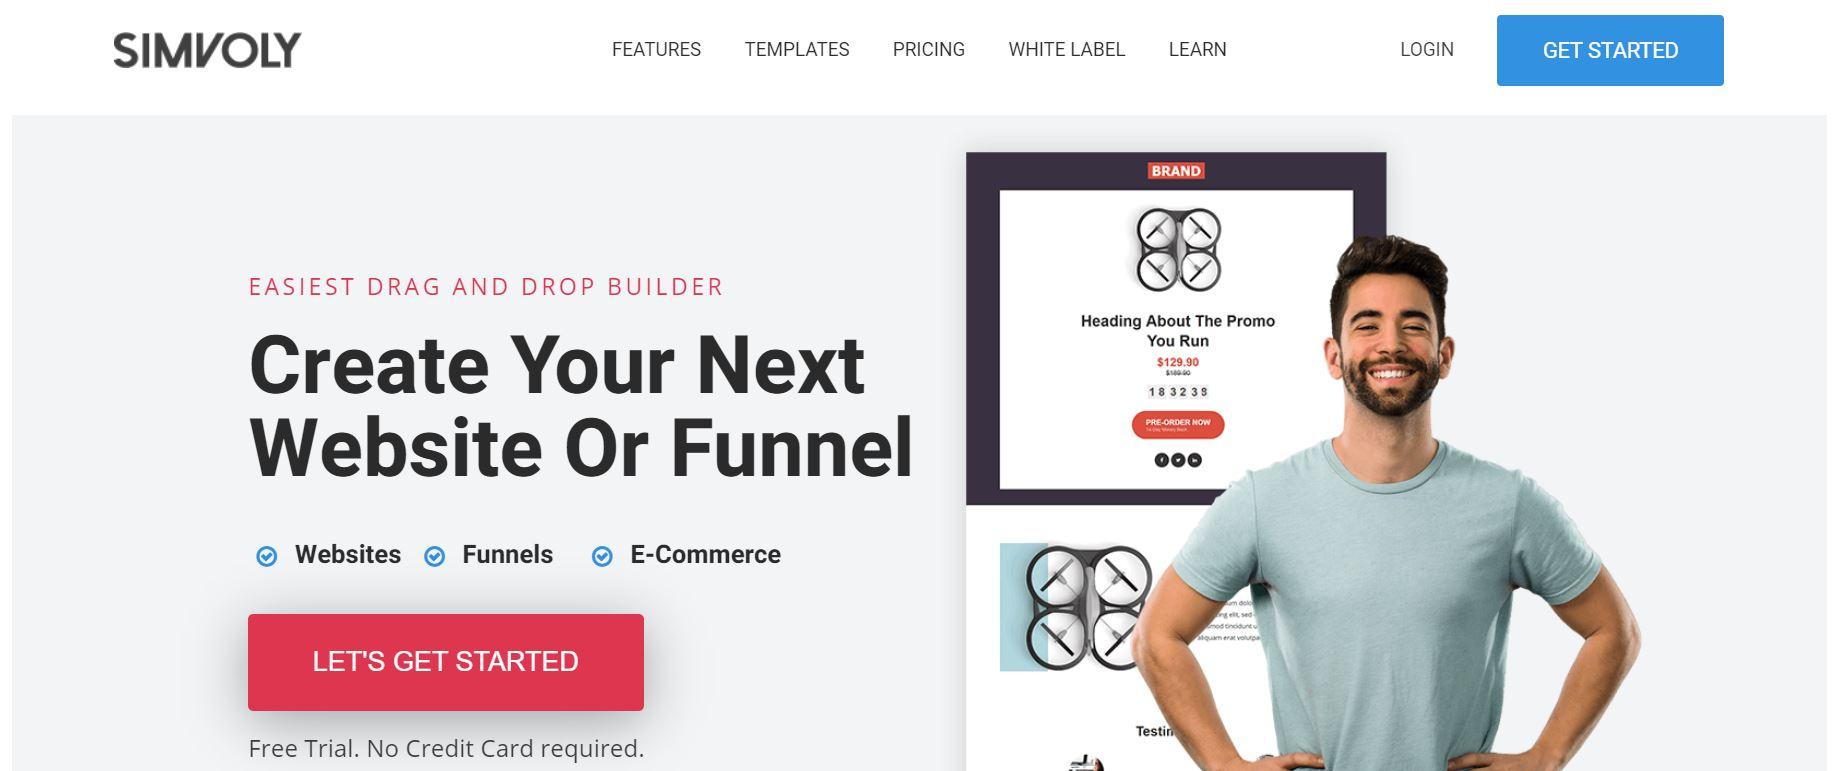 Simvoly网站构建器。